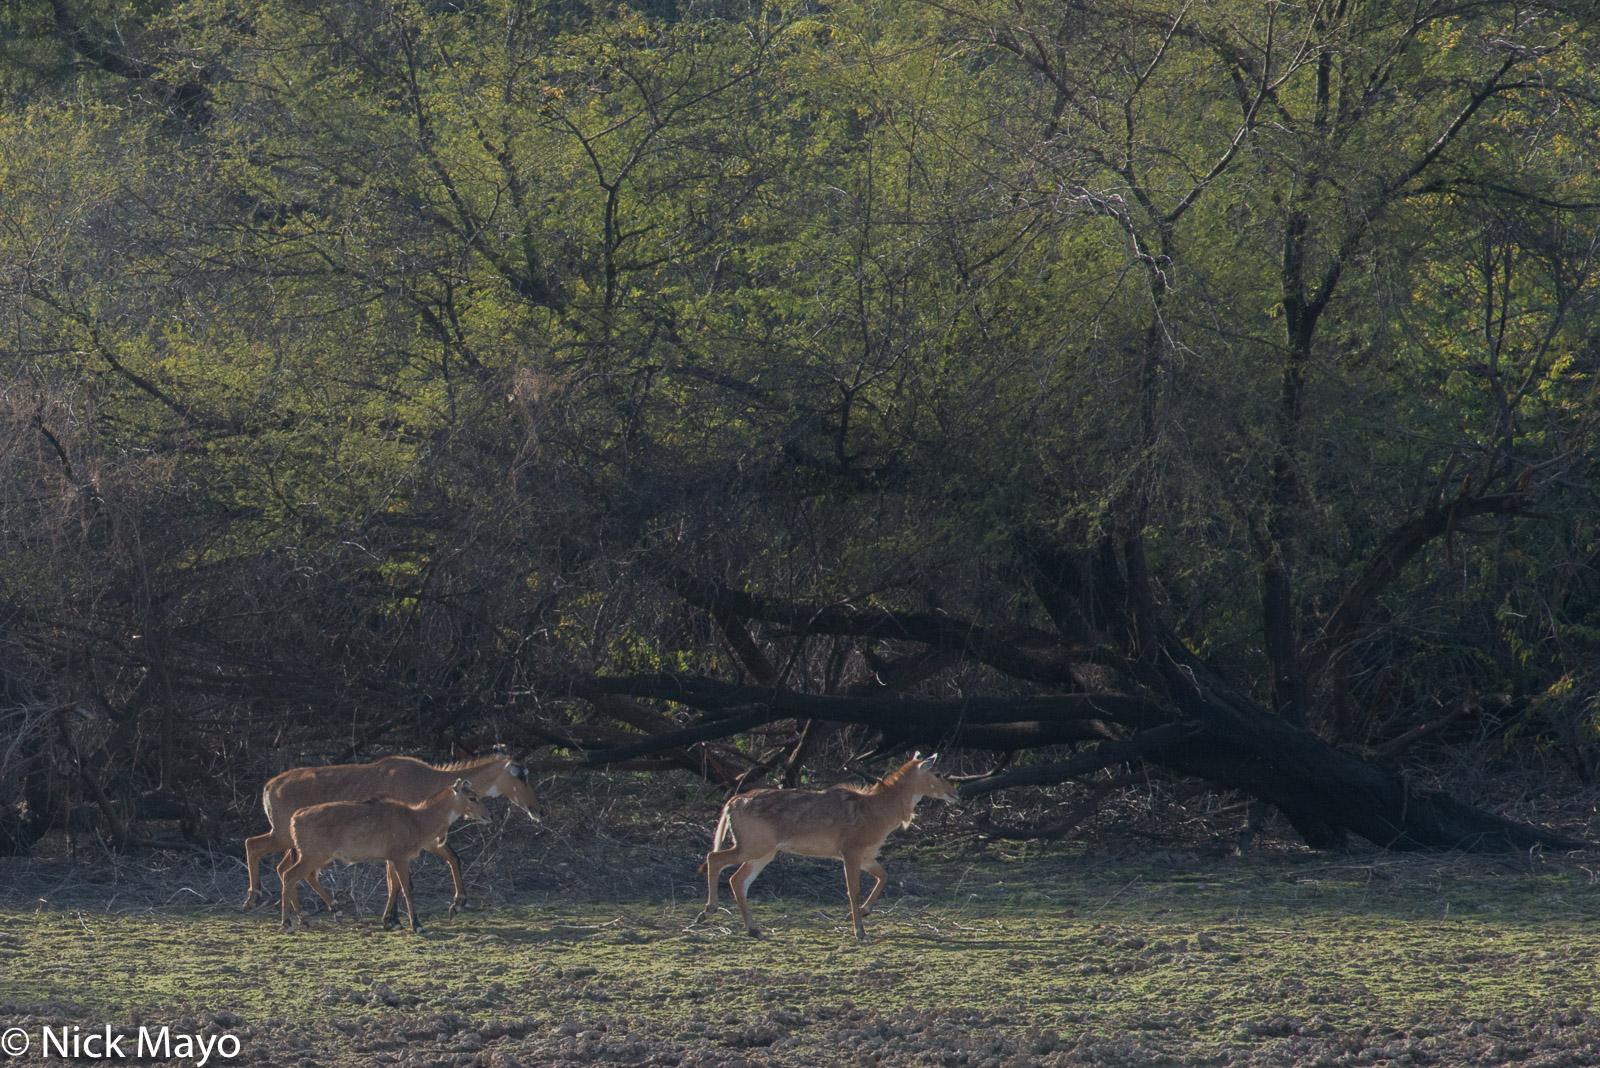 Deer, India, Rajasthan, photo